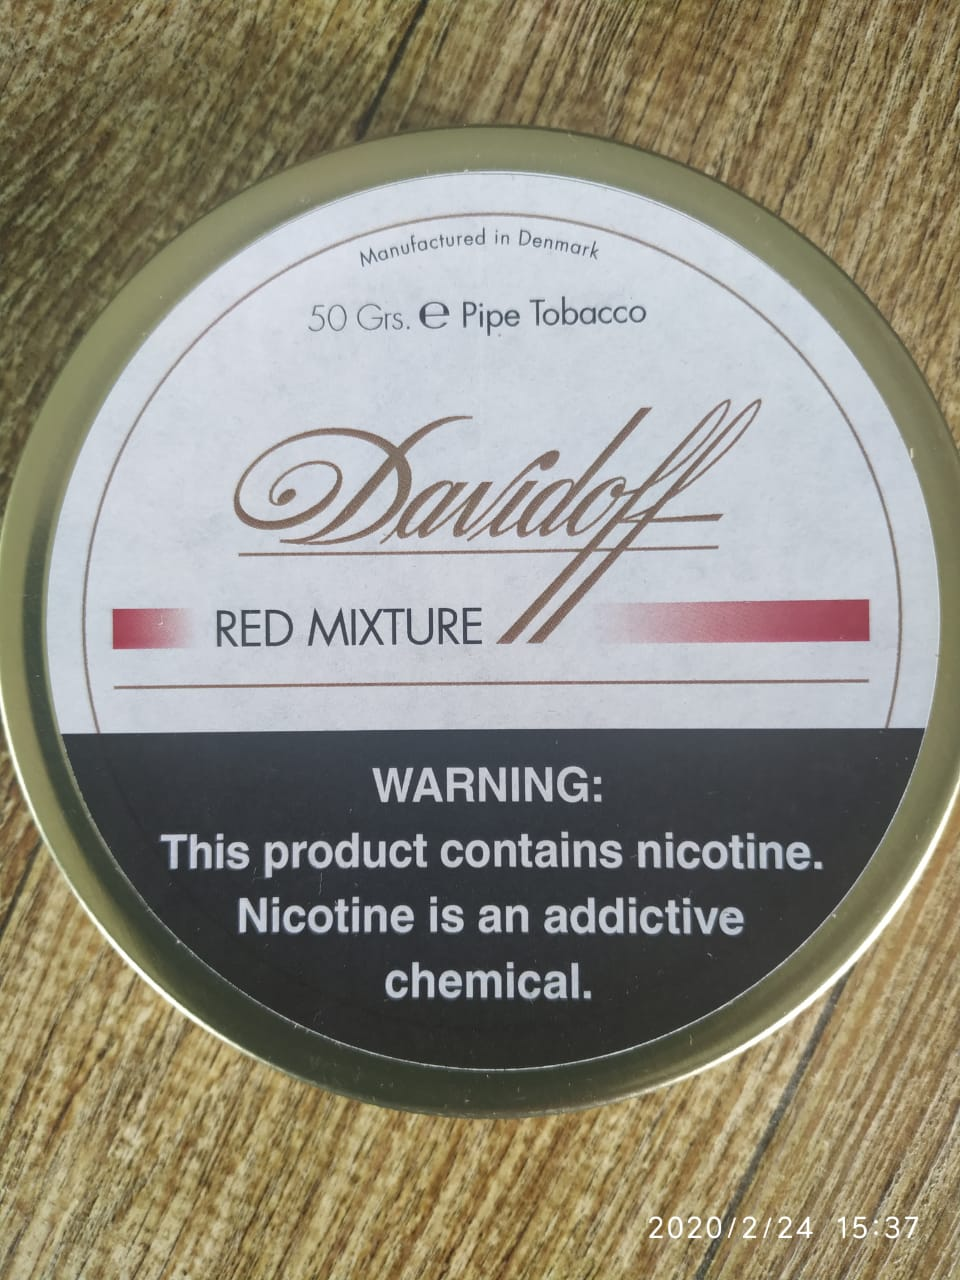 Davidoff - Red Mixture